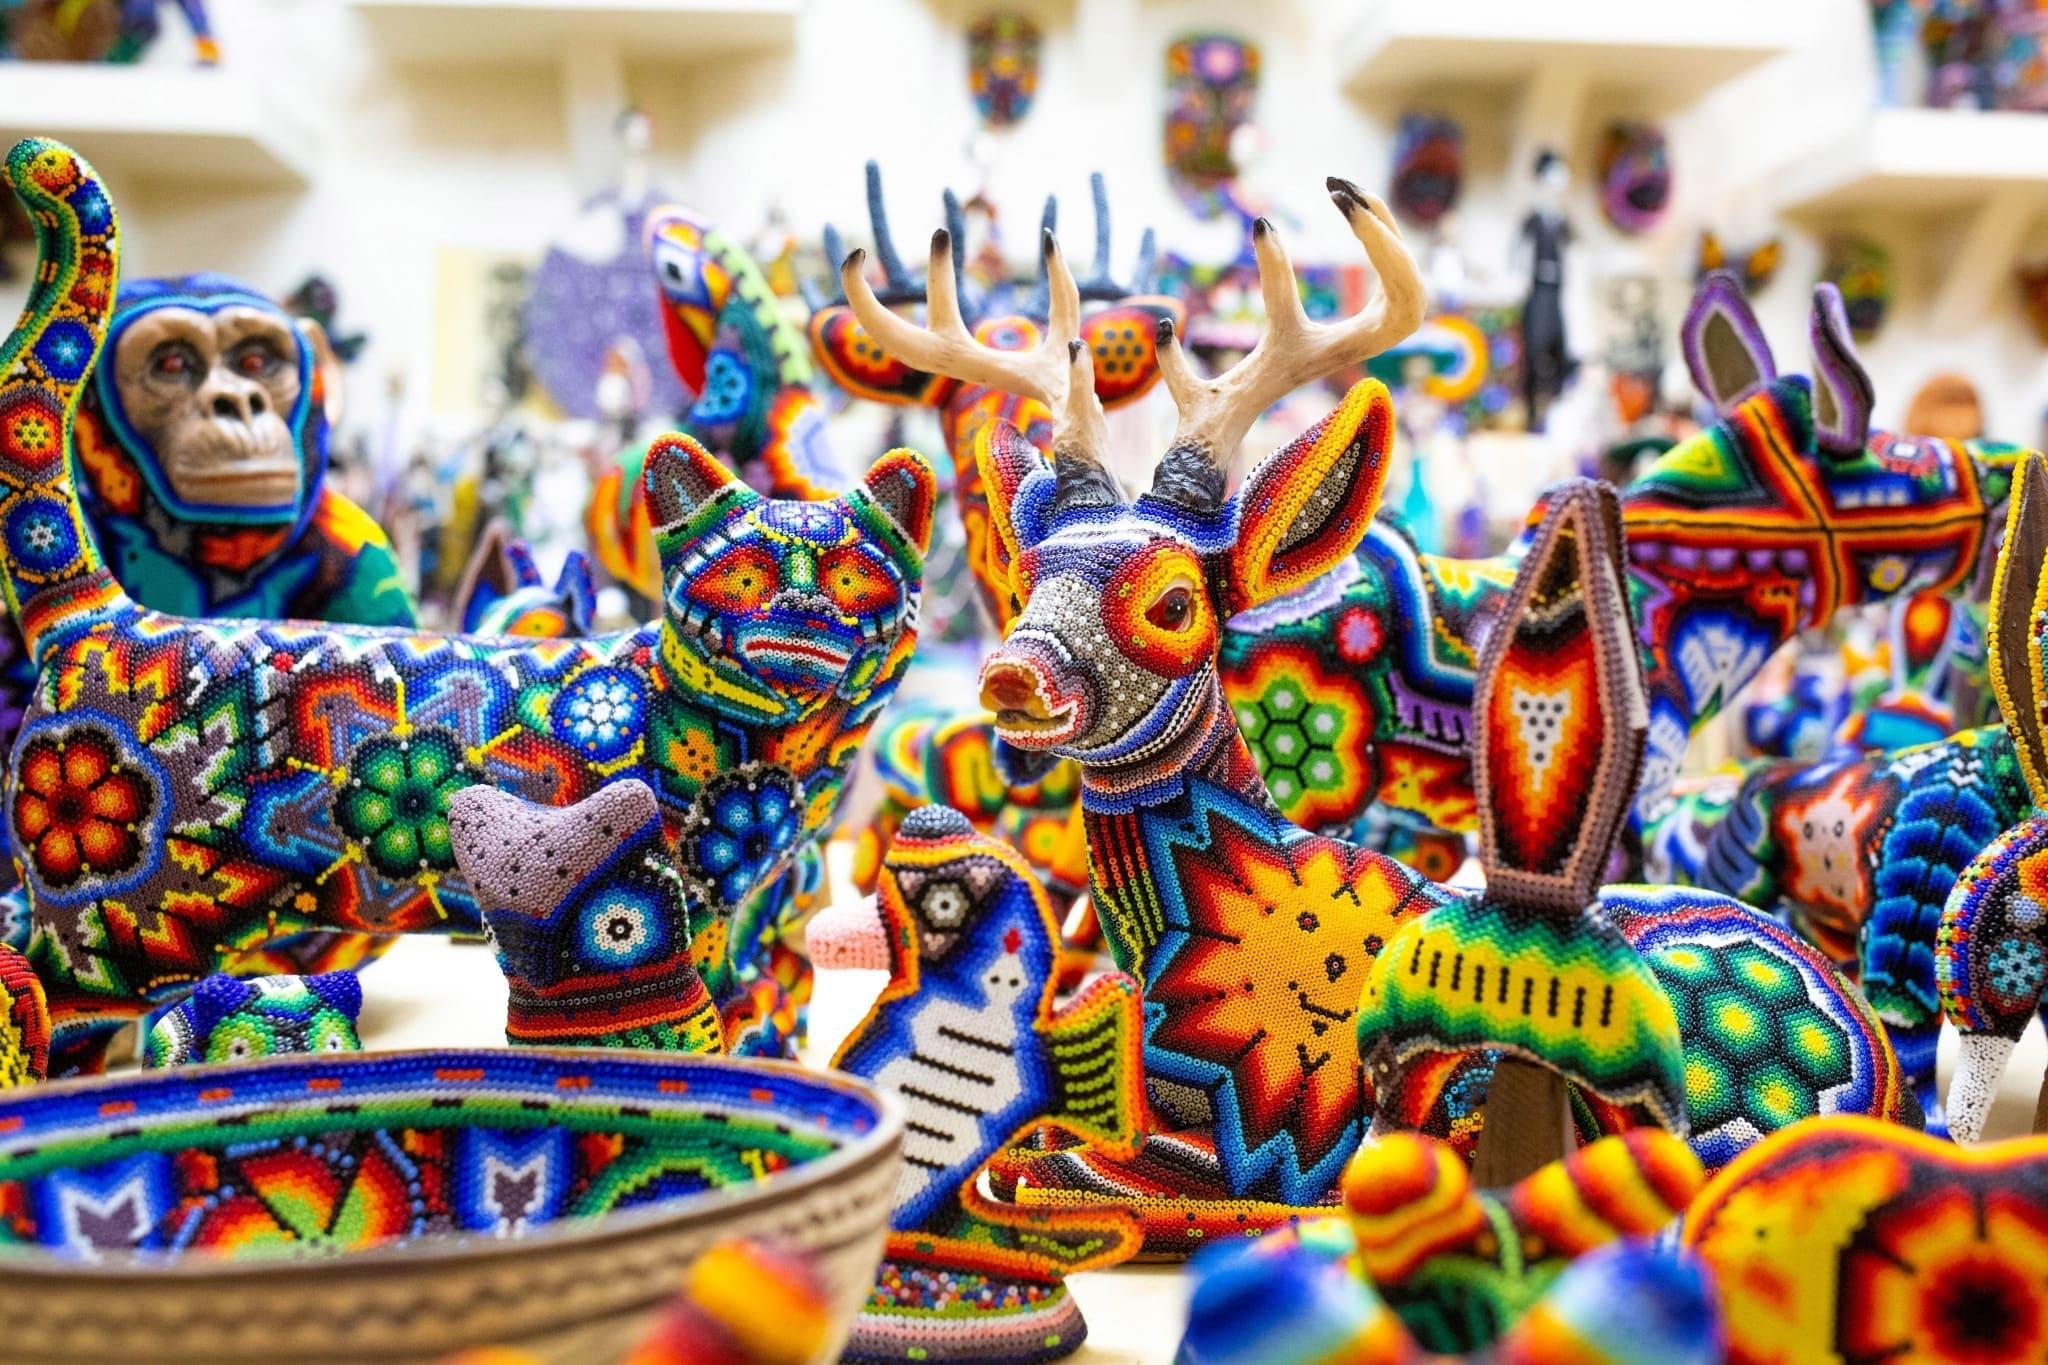 Arte-Huichol puerto vallarta méxico (1) (1)